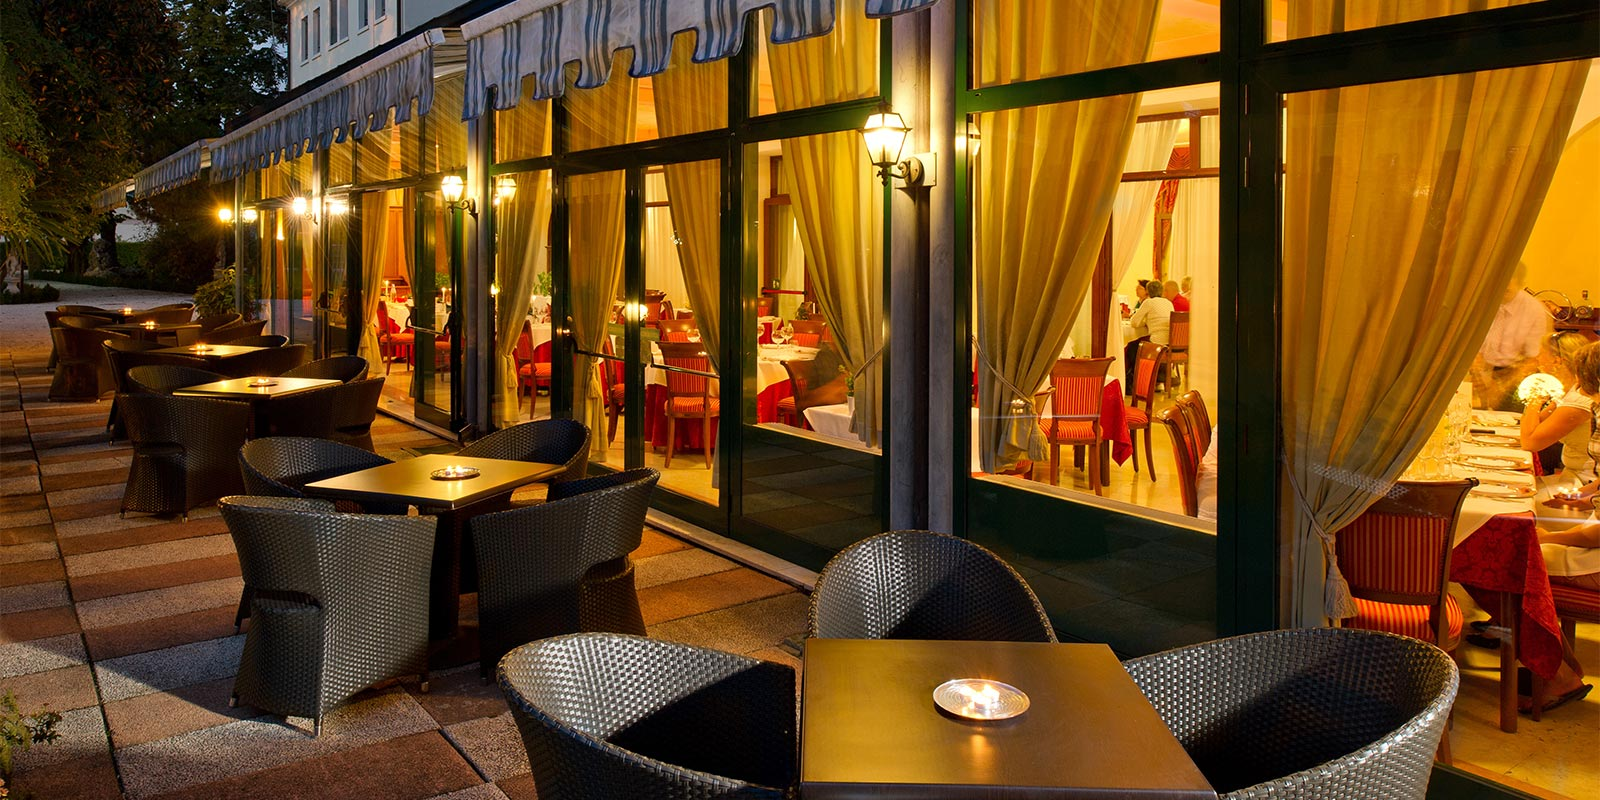 villa pace bolognese restaurant hotel with restaurant treviso